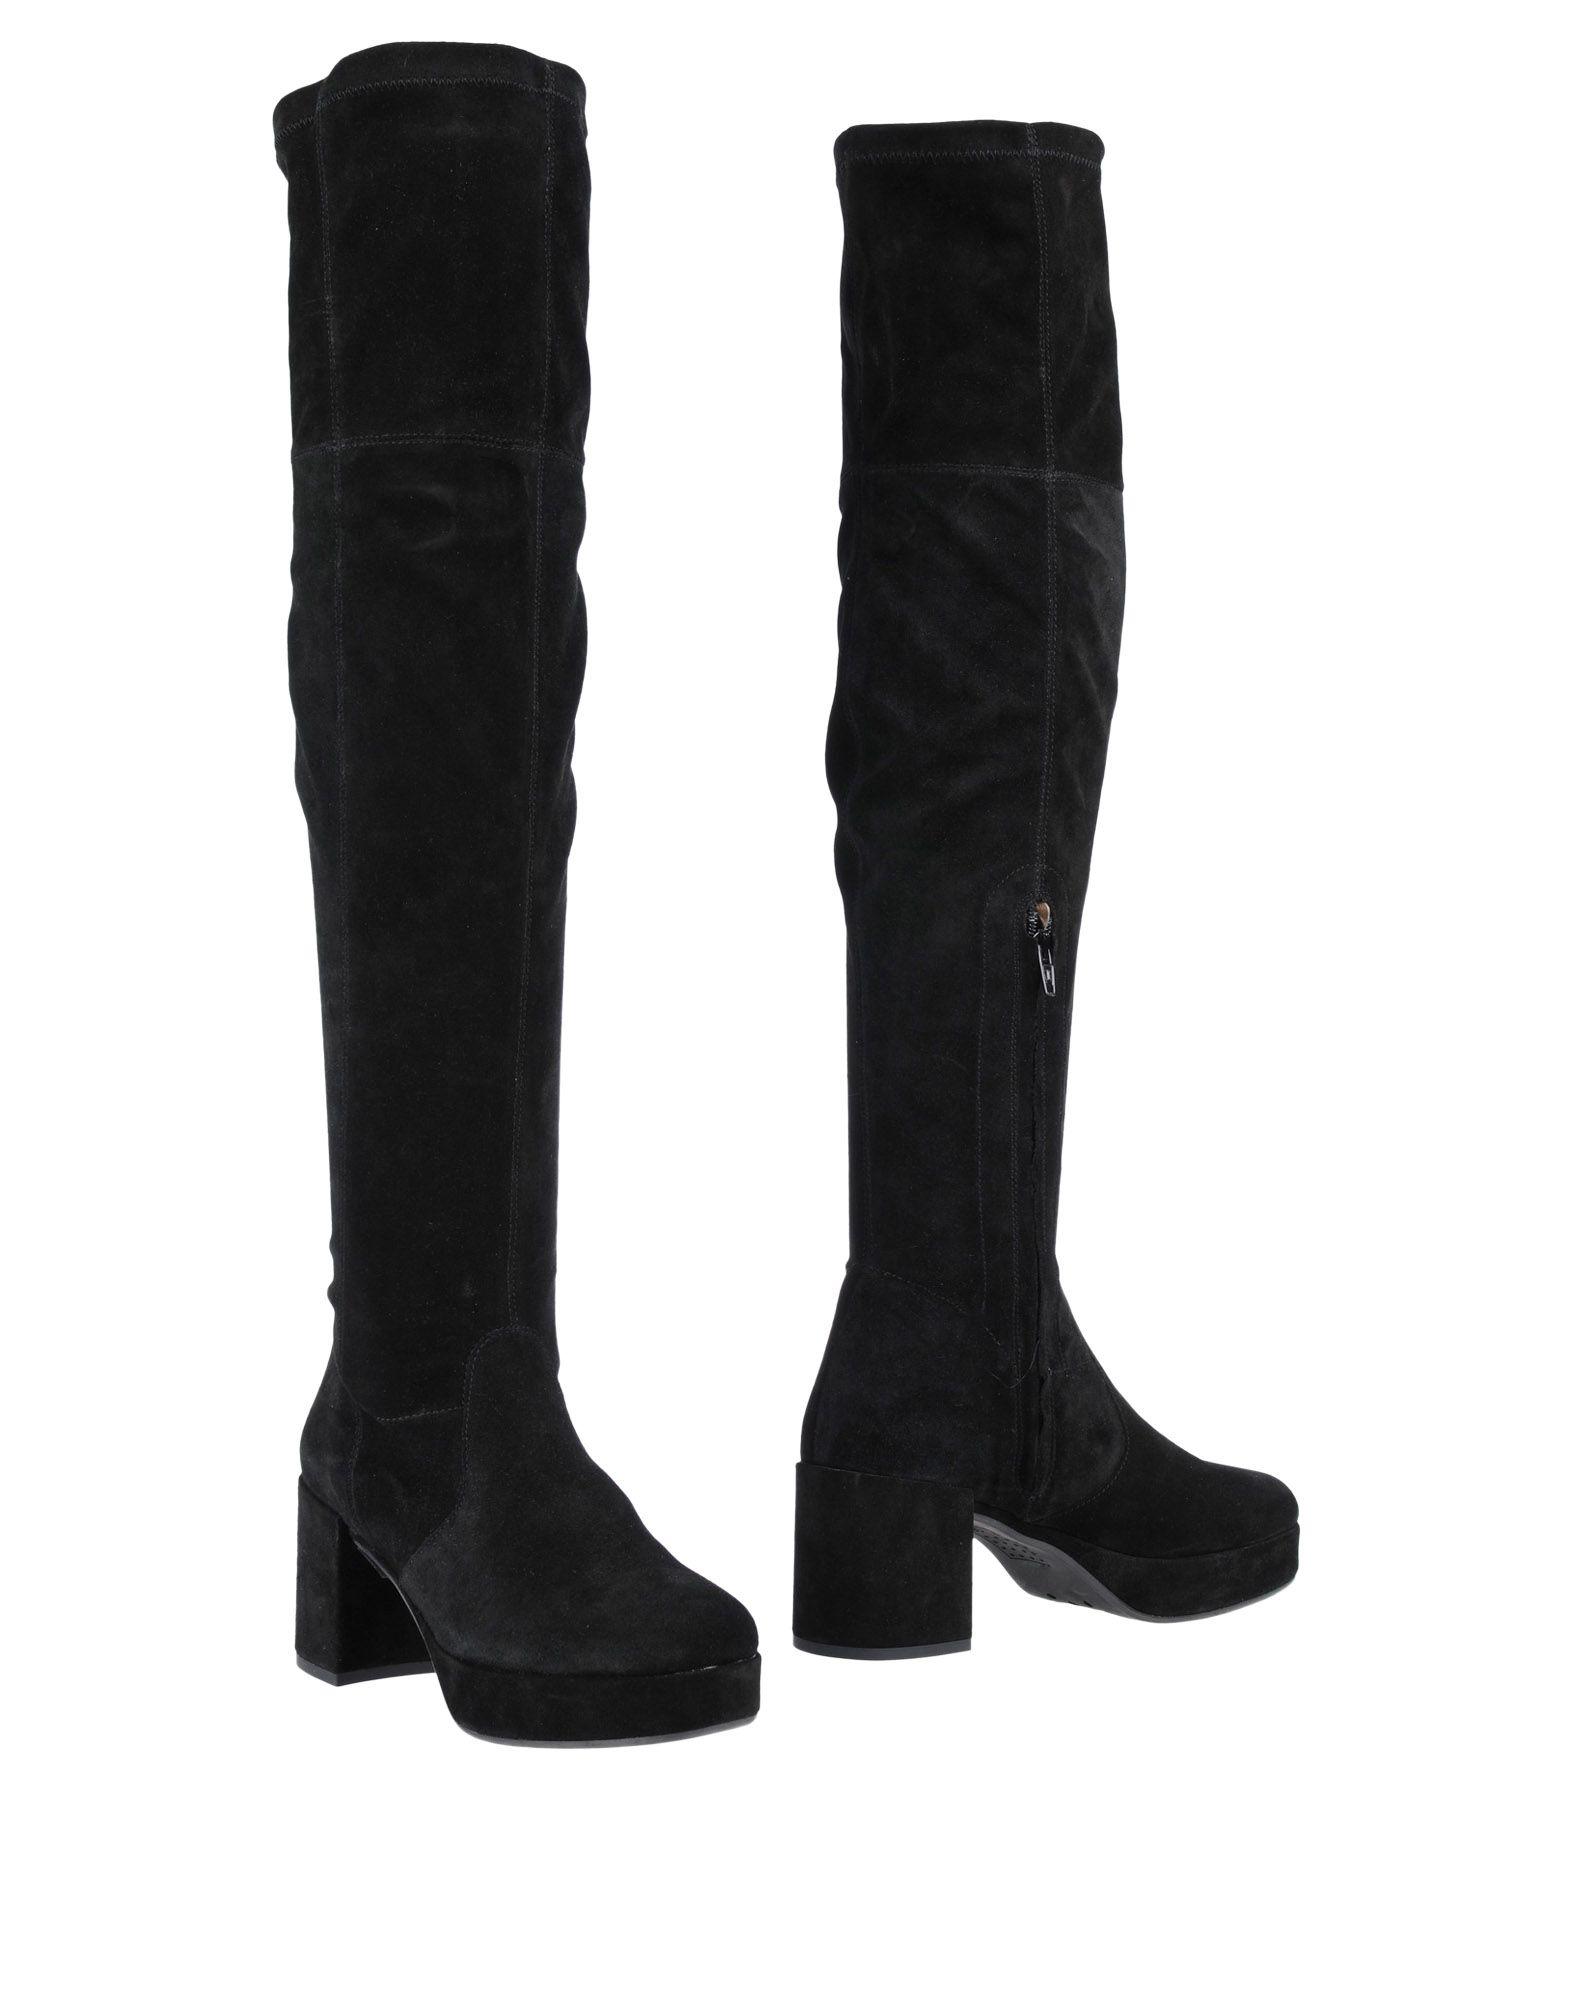 Pf16 Boots - Women Pf16 Boots online 11456320AL on  Australia - 11456320AL online 50d864